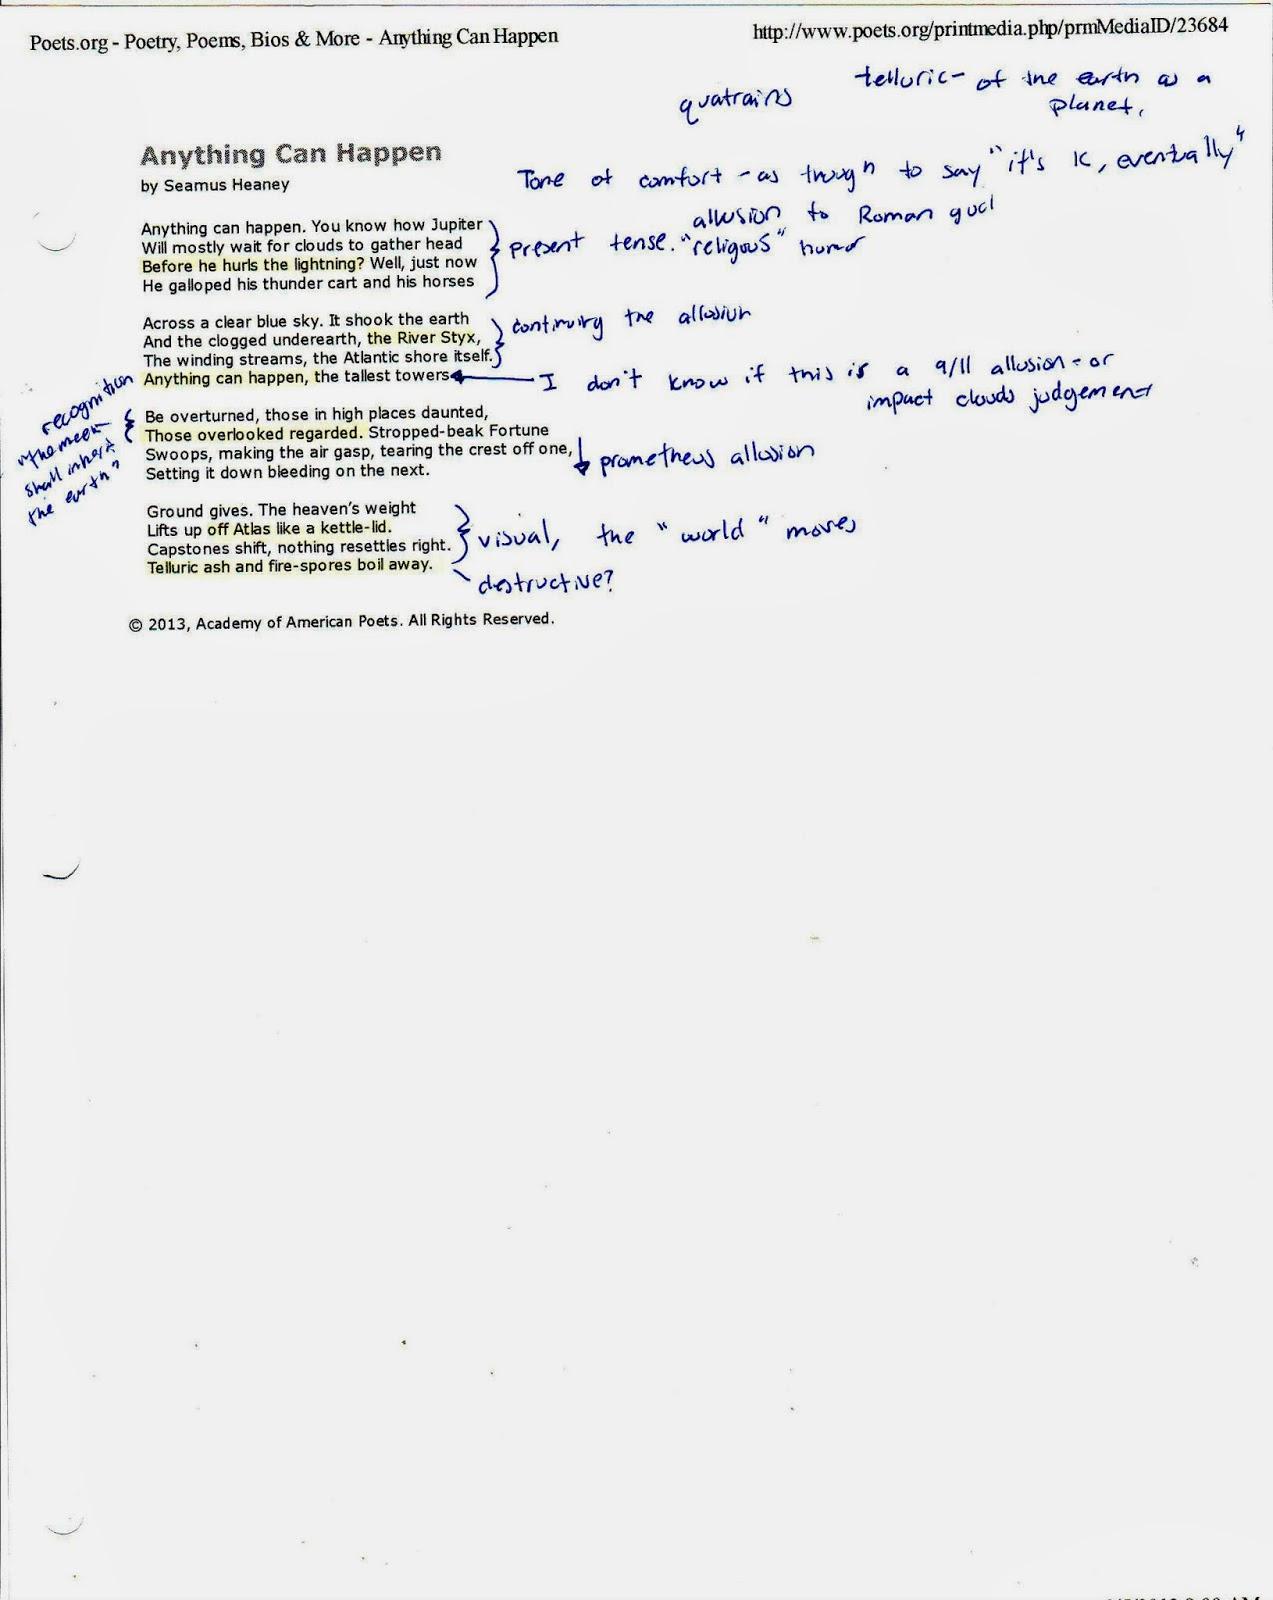 seamus heaney essays seamus heaney poetry essay essay writing help  seamus heaney criticism and essays seamus heaney criticism and essays